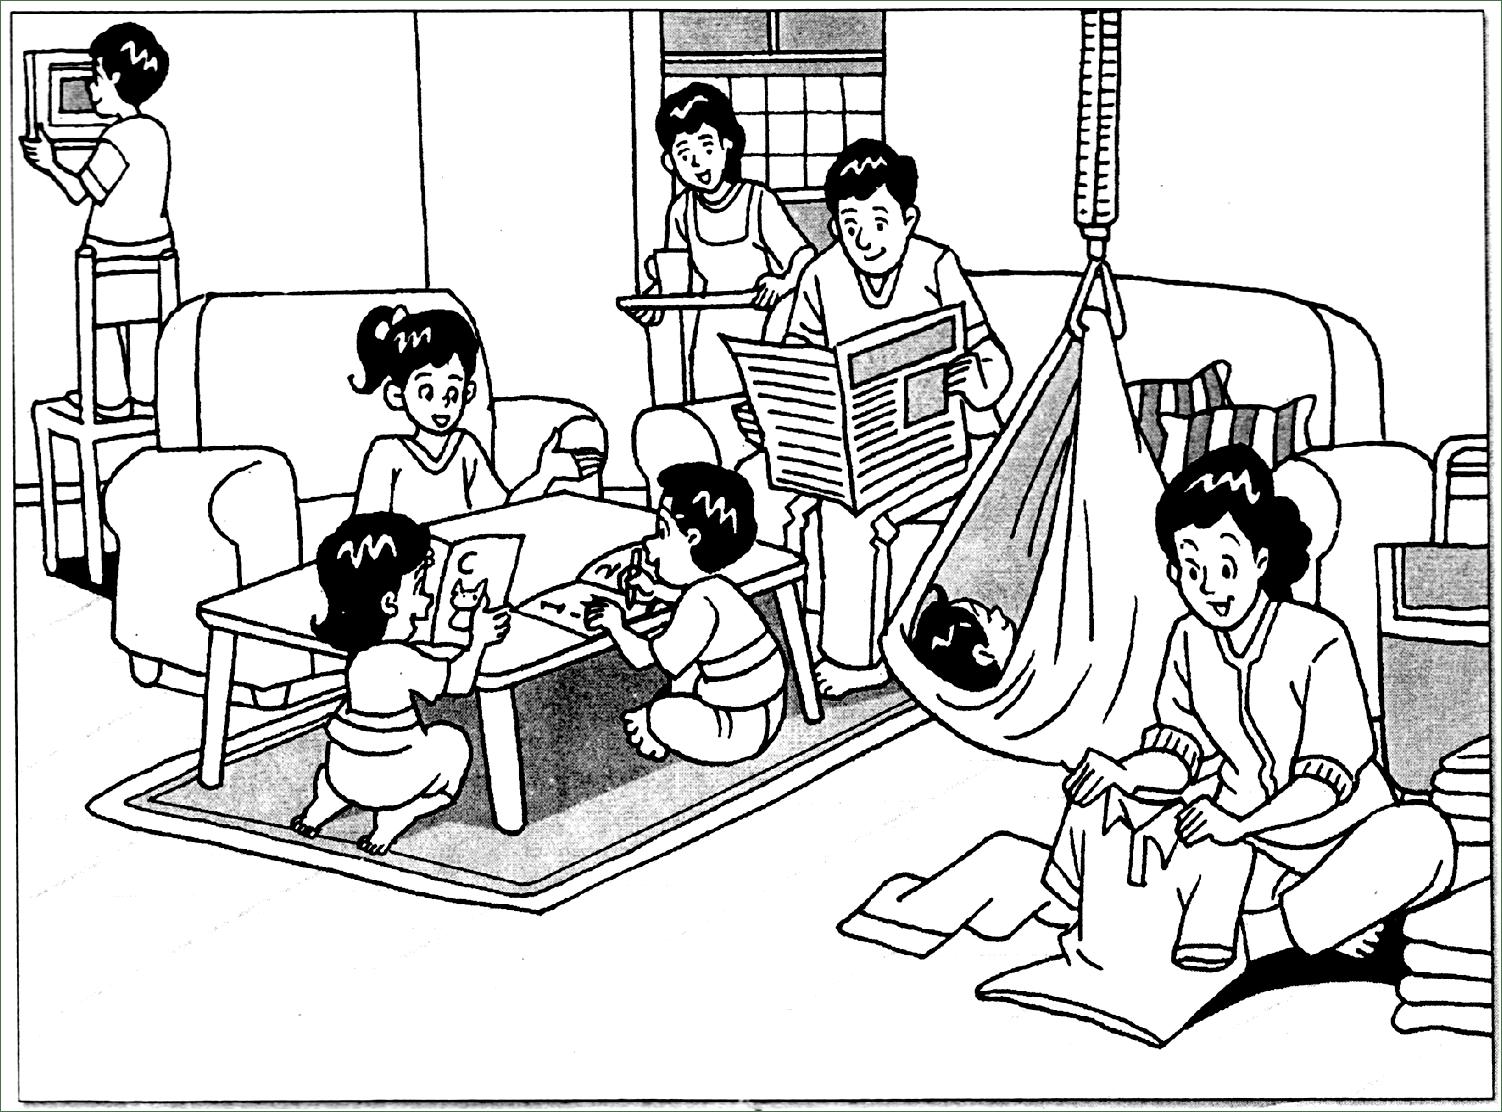 Gambar Di Bawah Menunjukkan Situasi Ruang Tamu Tulis Lima Ayat Yang Lengkap Tentang Aktiviti Terdapat Dalam